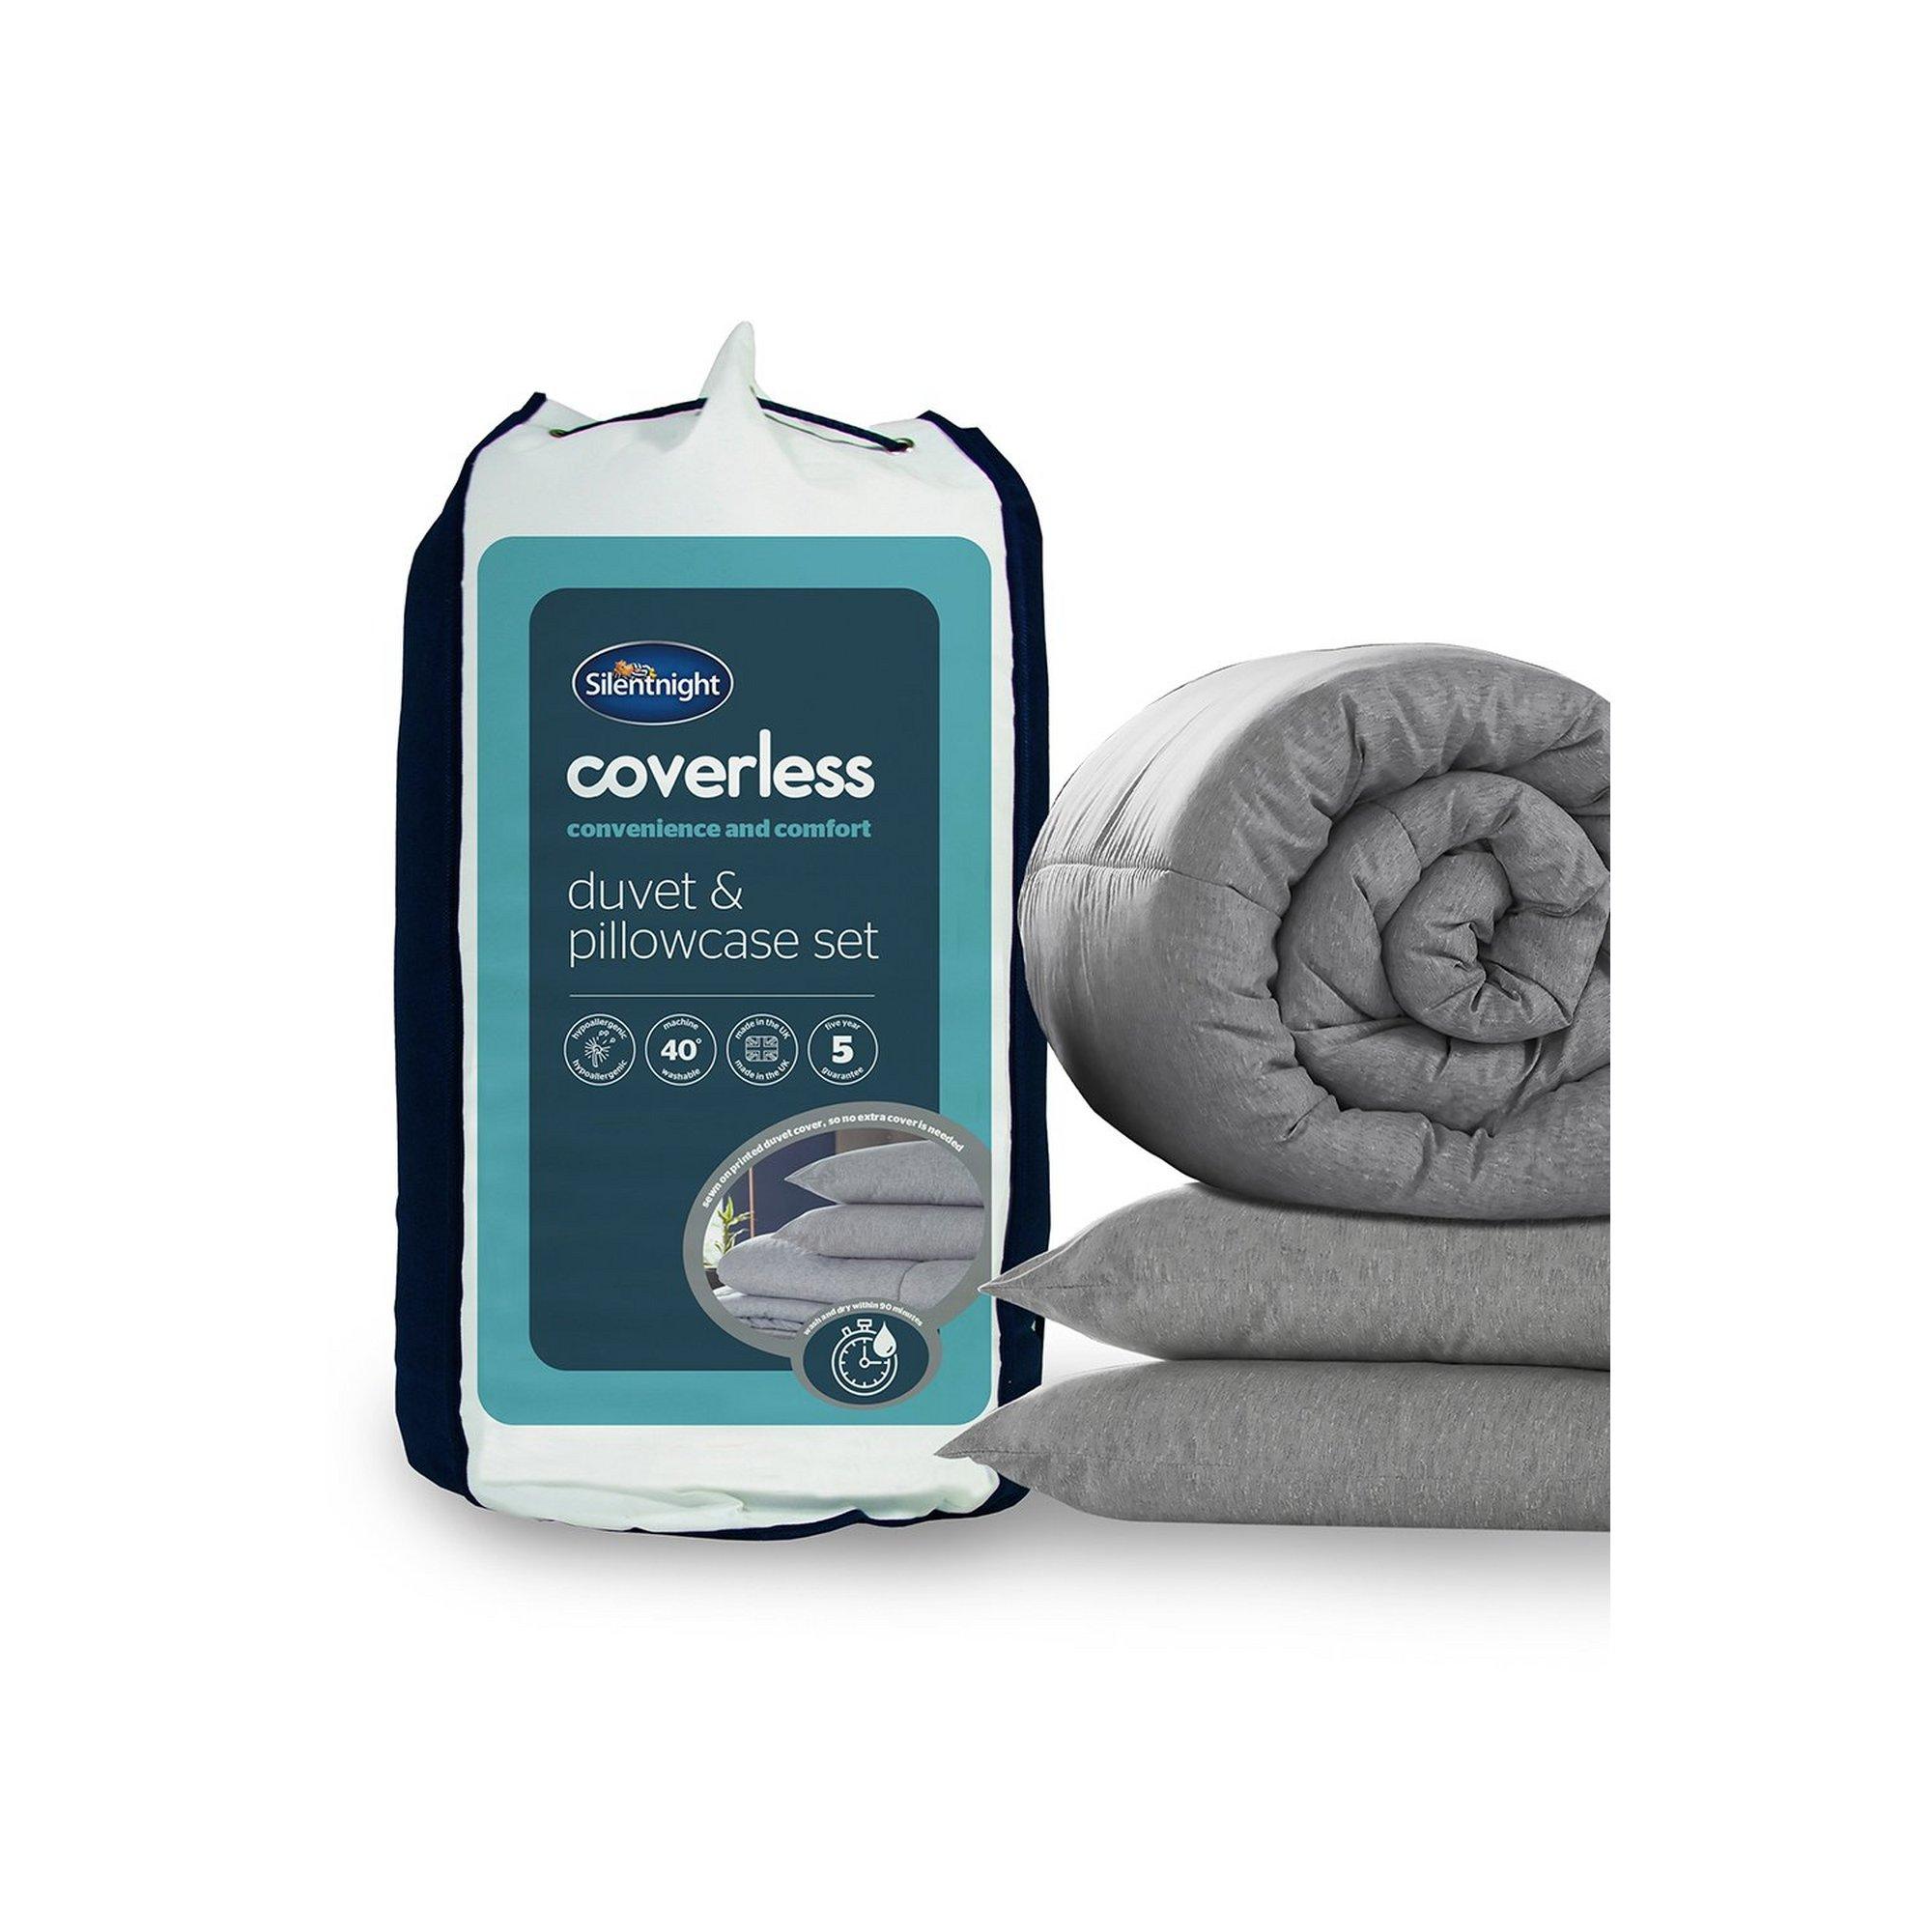 Image of Silentnight Marl Coverless Bed Set